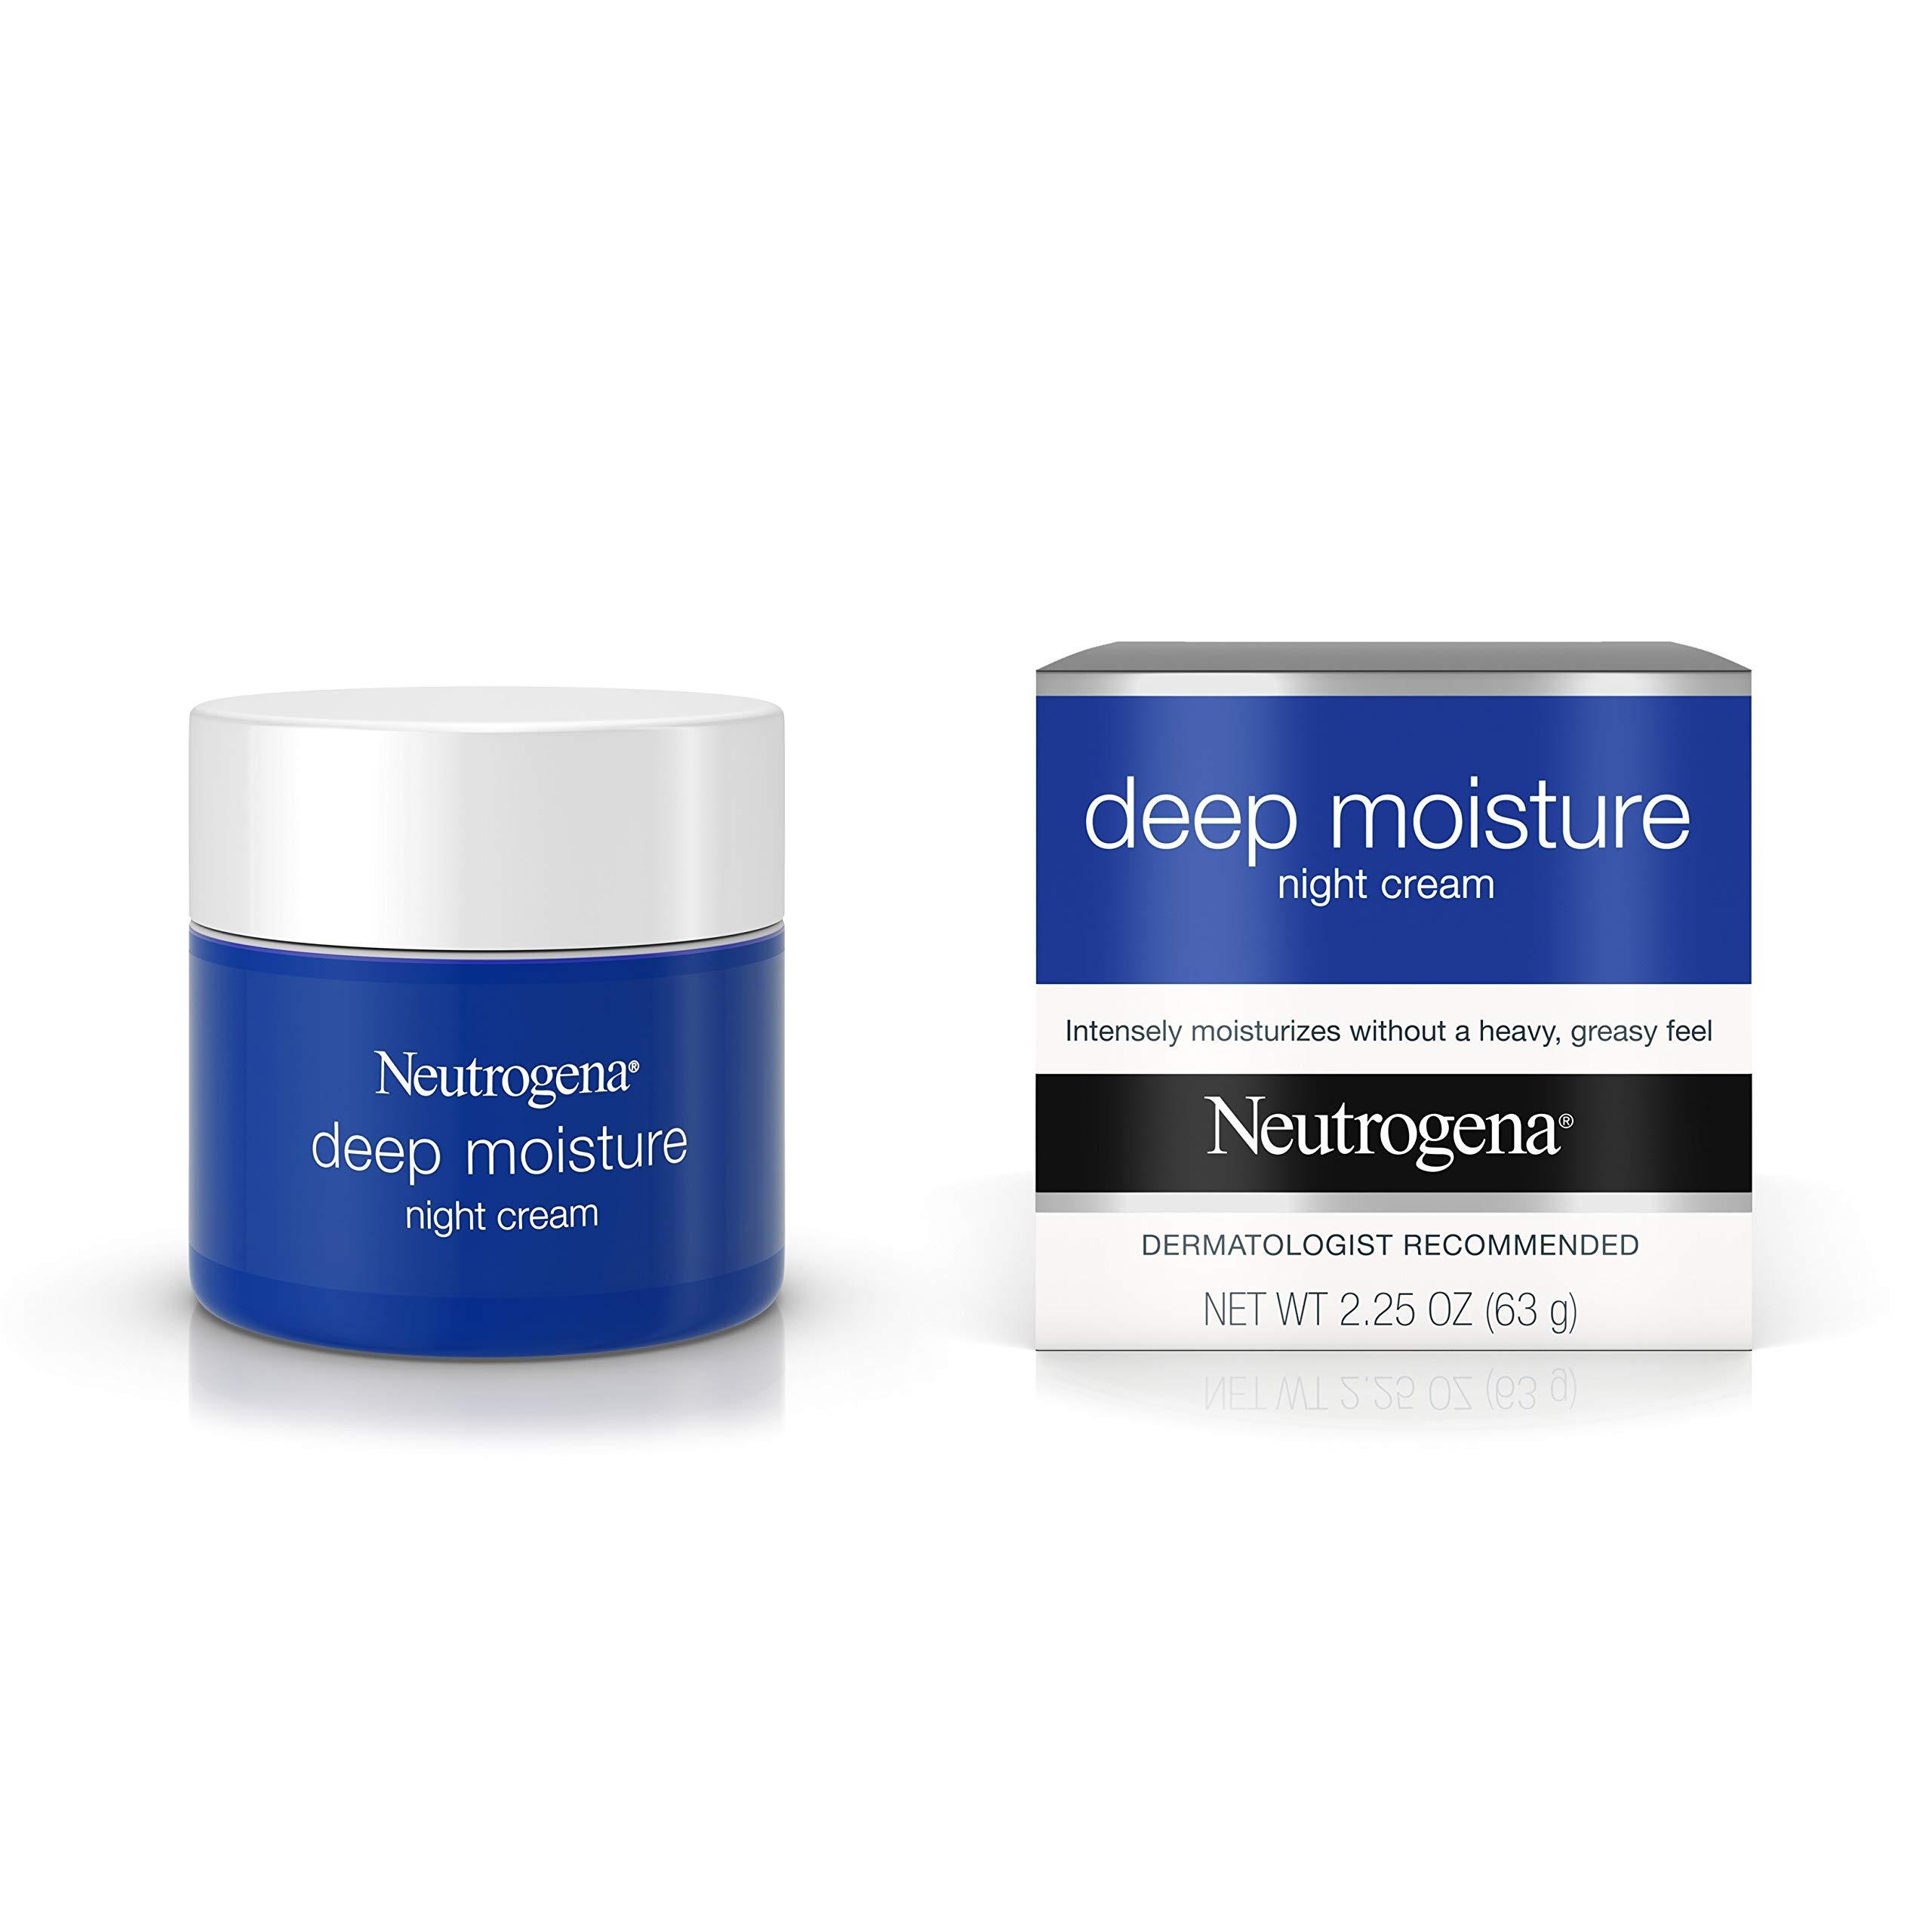 Neutrogena Deep Moisture Night Cream with Glycerin & Vitamin D3 for $14.49